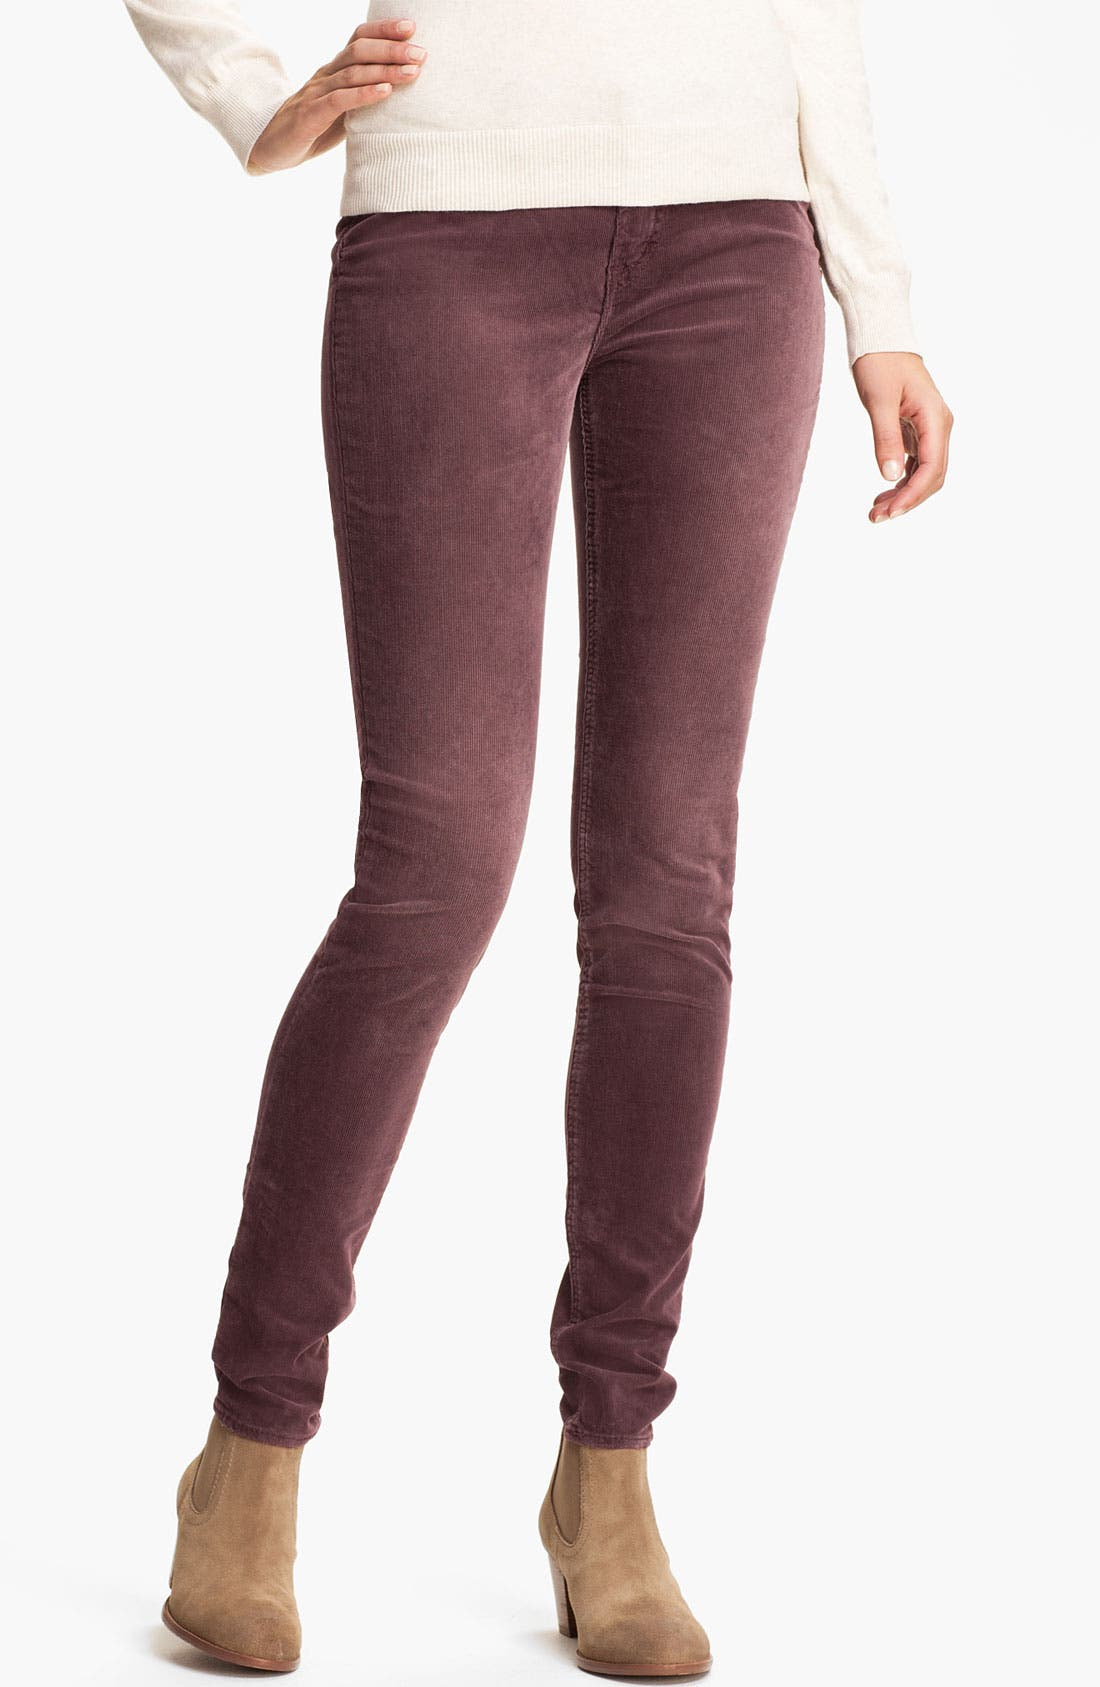 Alternate Image 1 Selected - Silver Jeans Co. 'Suki' Skinny Corduroy Pants (Juniors)